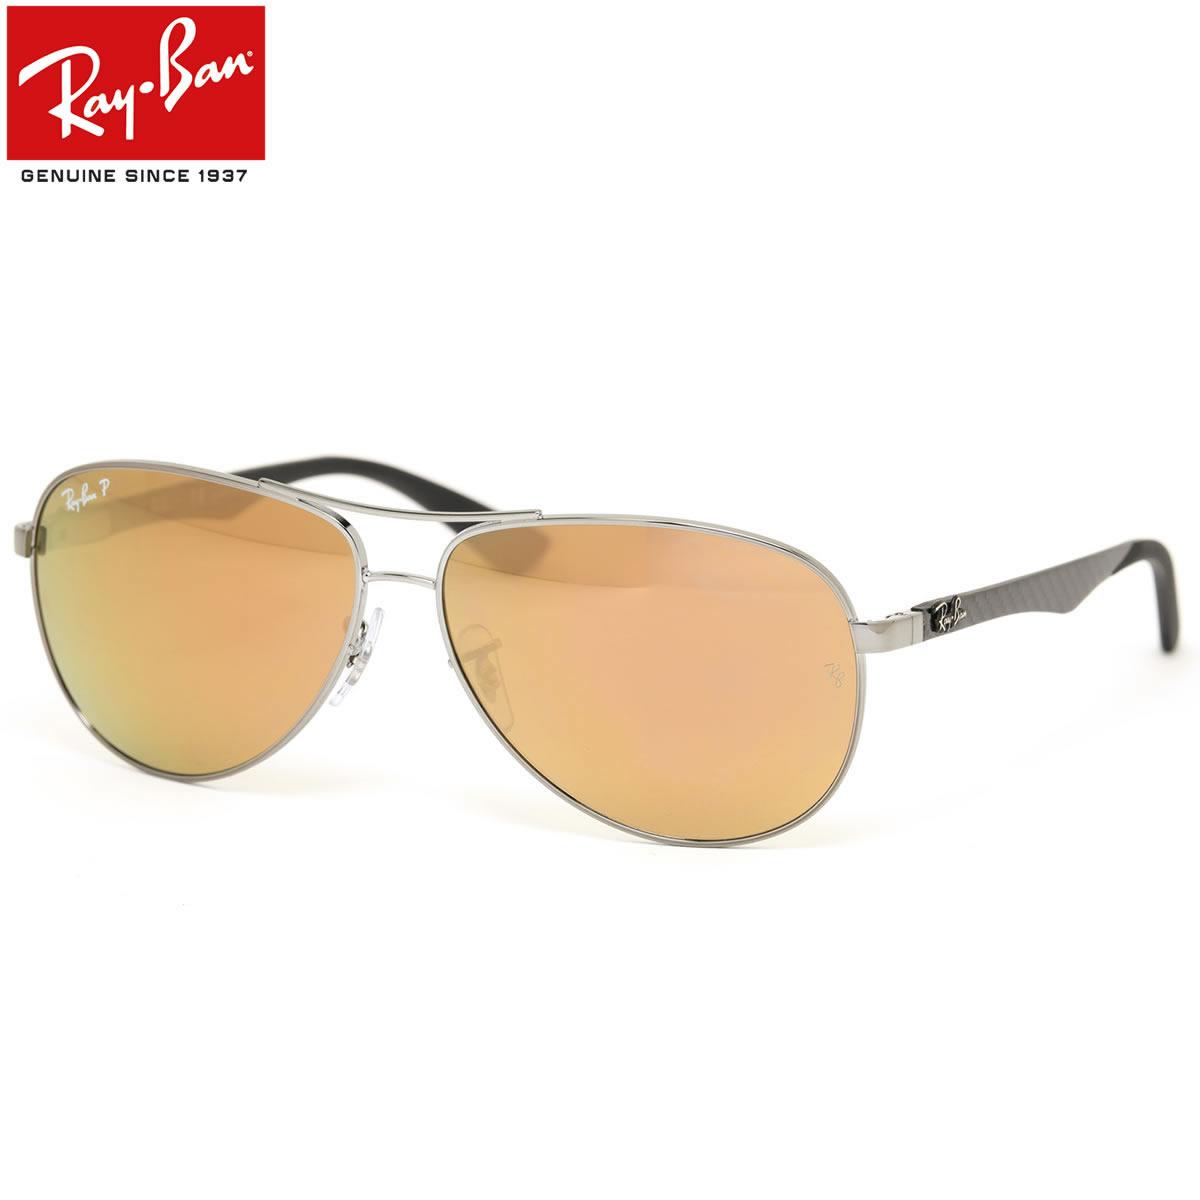 Ray Ban RB8313 004/N3 61mm 1 ihvNmz9